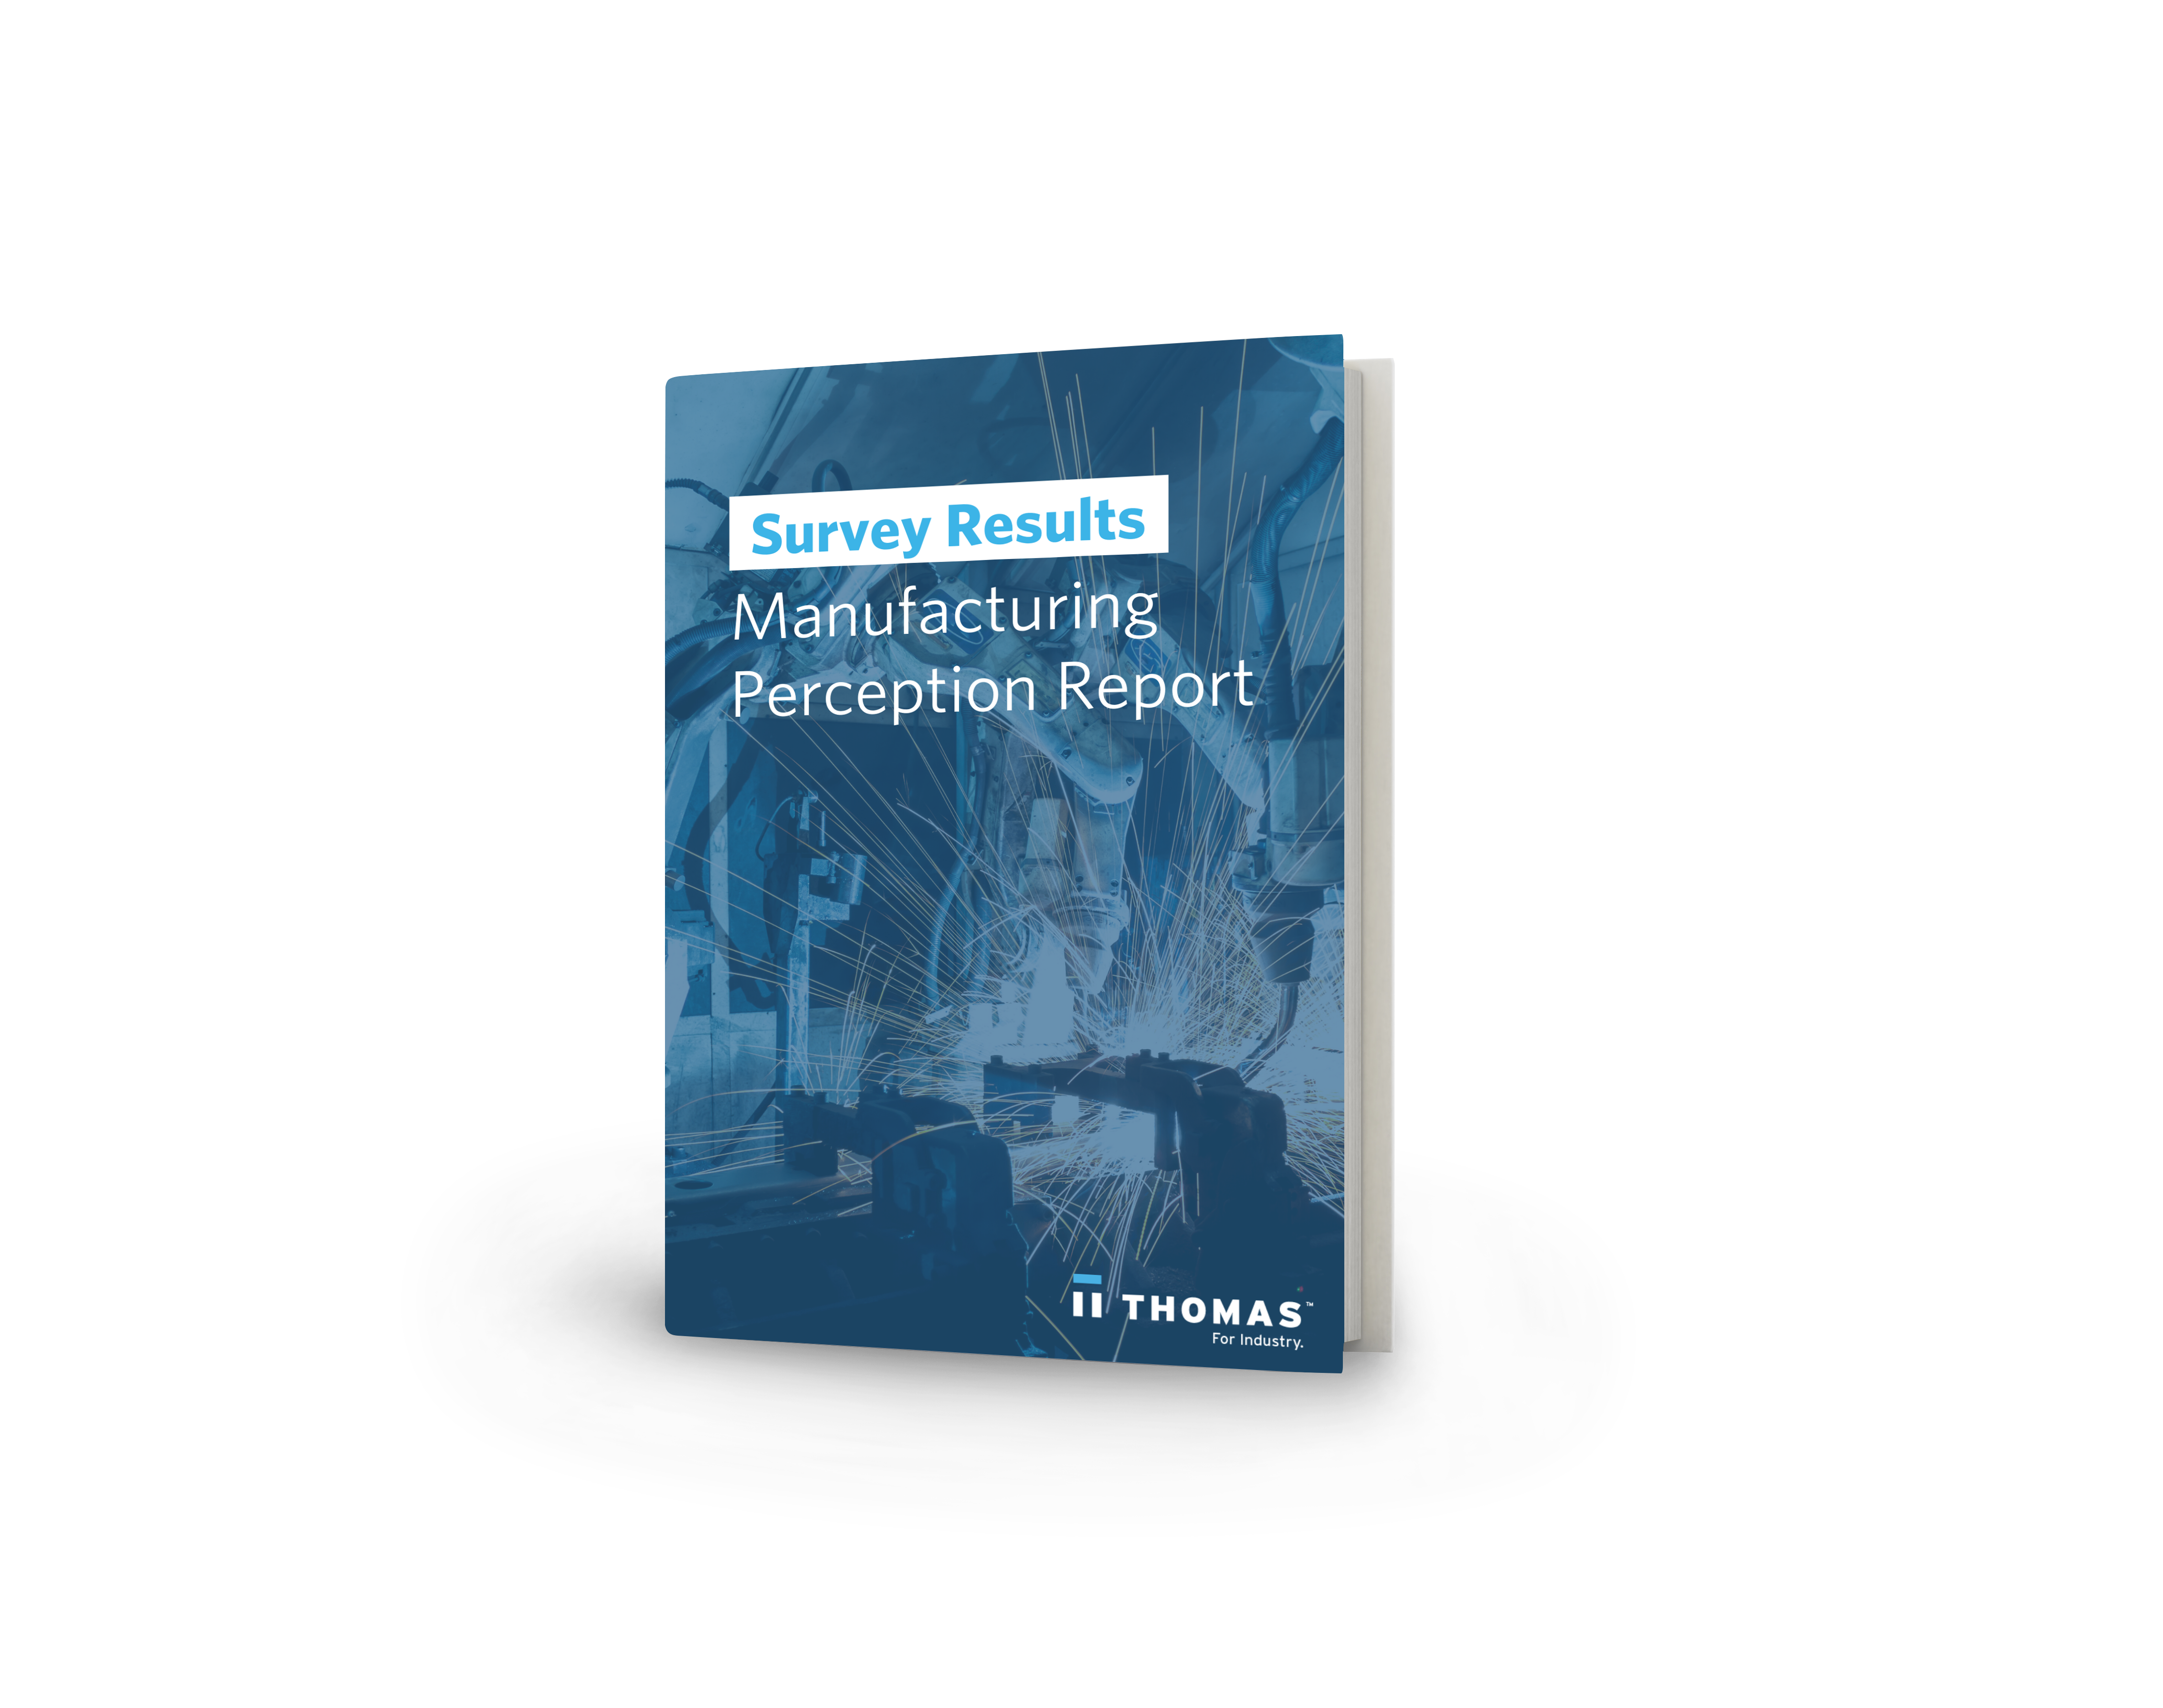 Manufacturing Perception Report